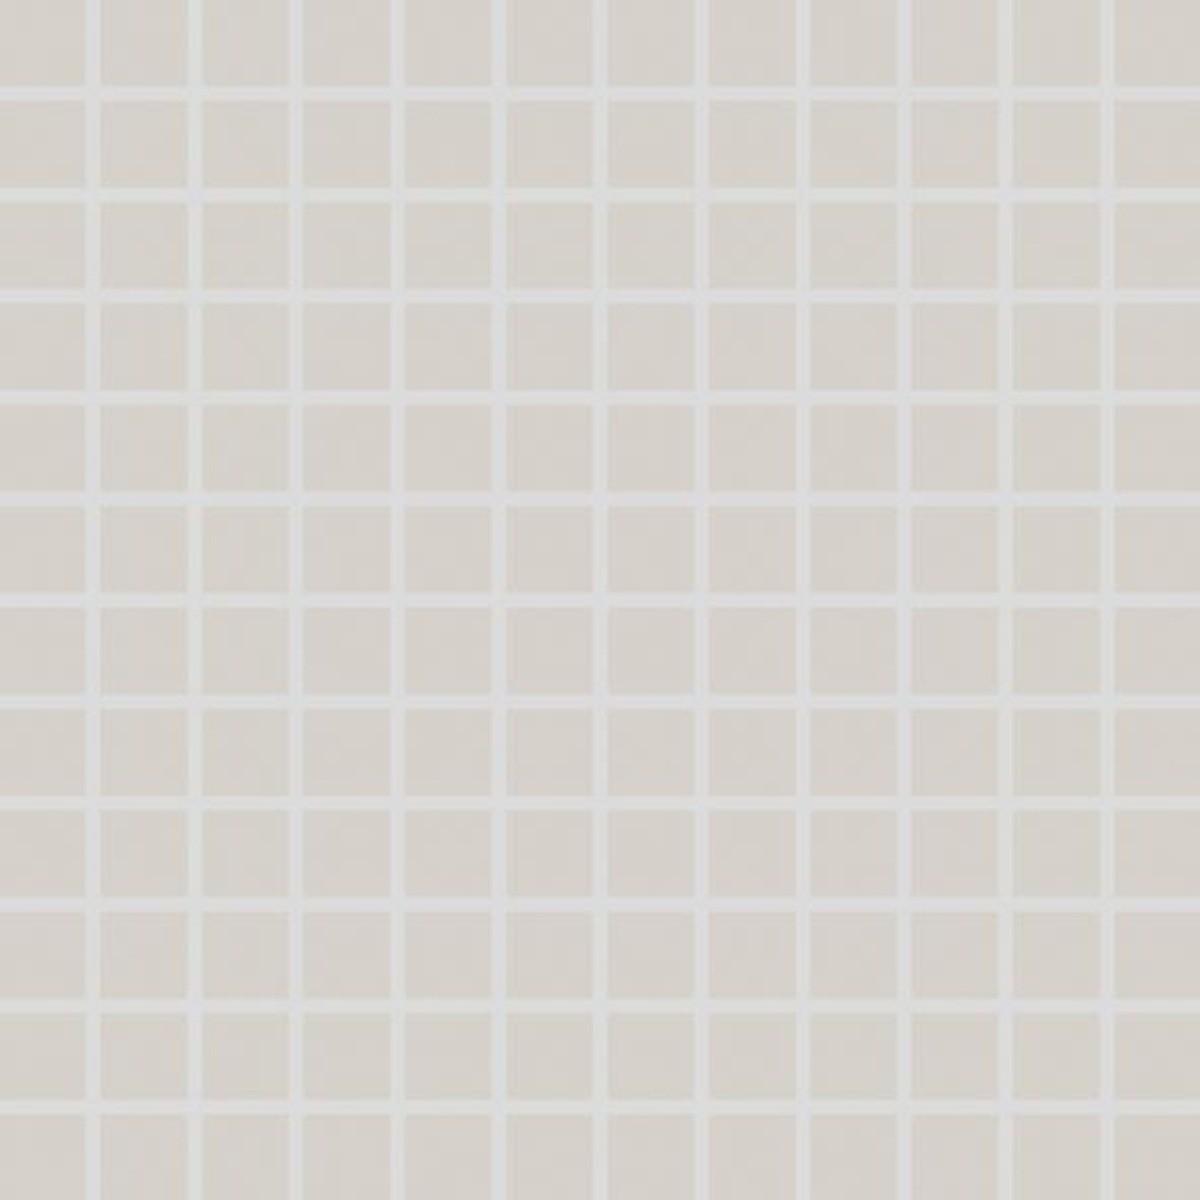 Mozaika Rako Color Two svetlo šedá 30x30 cm mat GDM02112.1